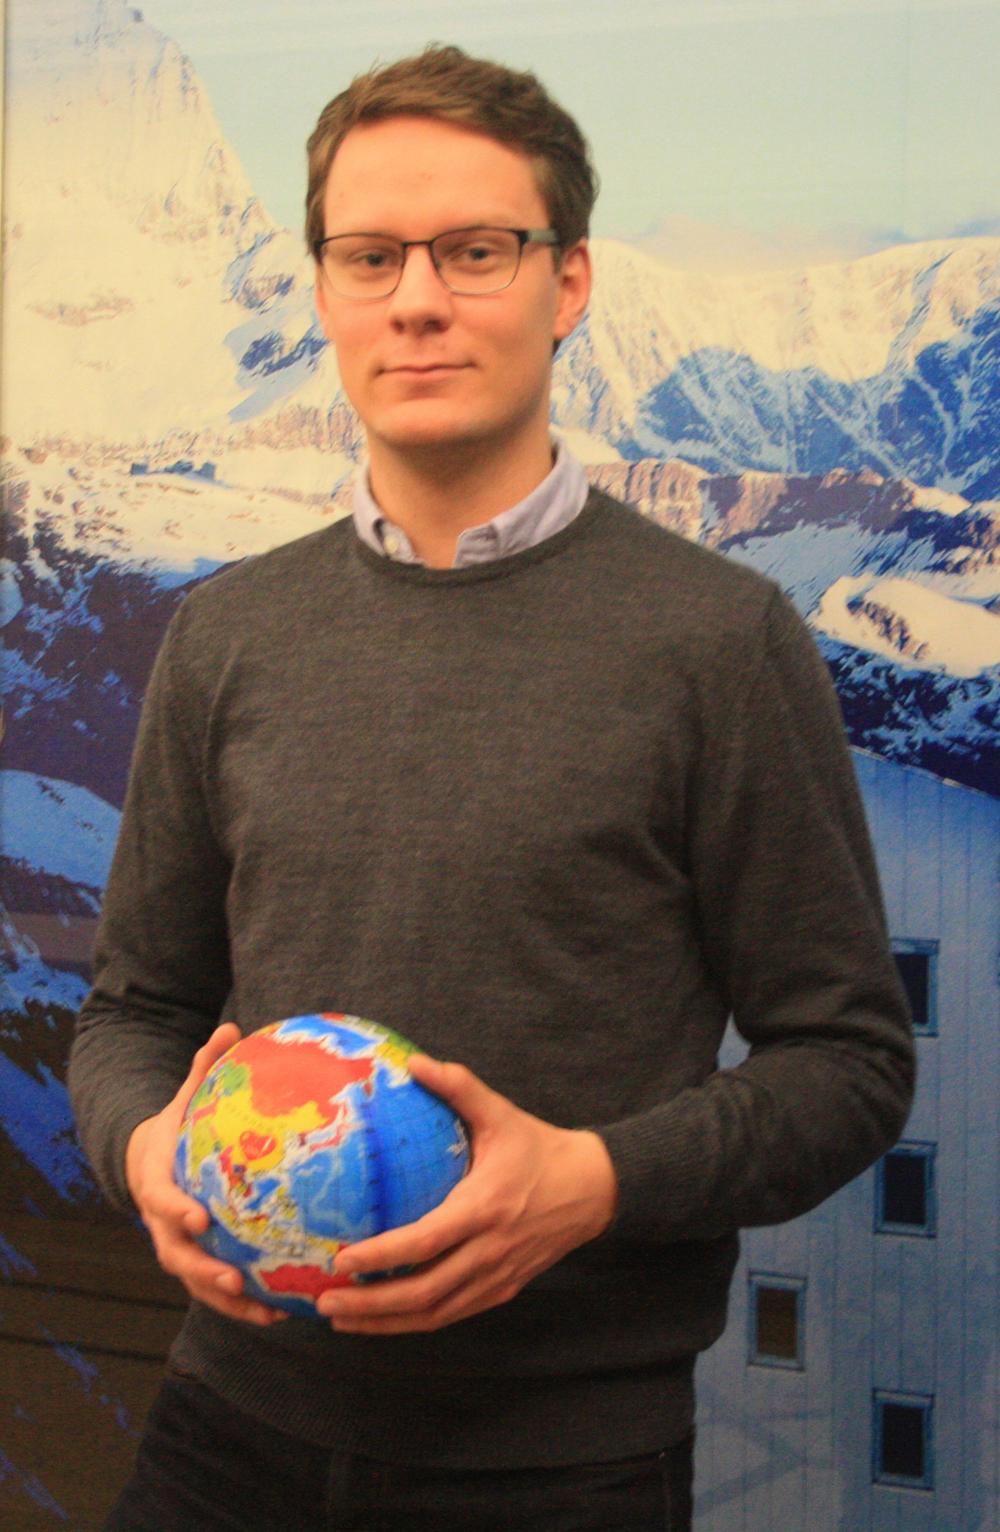 Lennart Bolliger